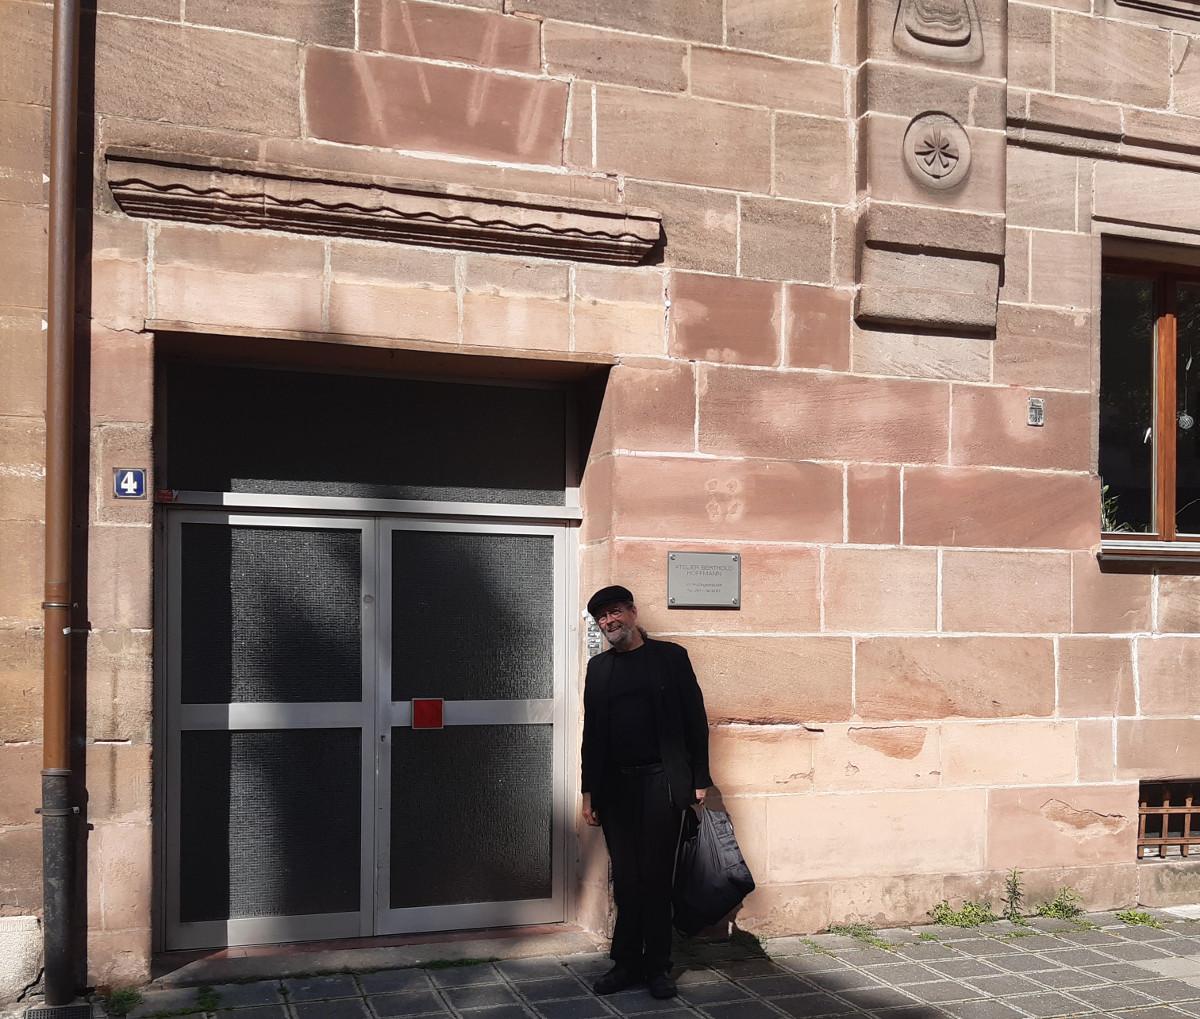 2021-07-14-02-17-17-11a.jpg - Atelier Haberbosch Nürnberg